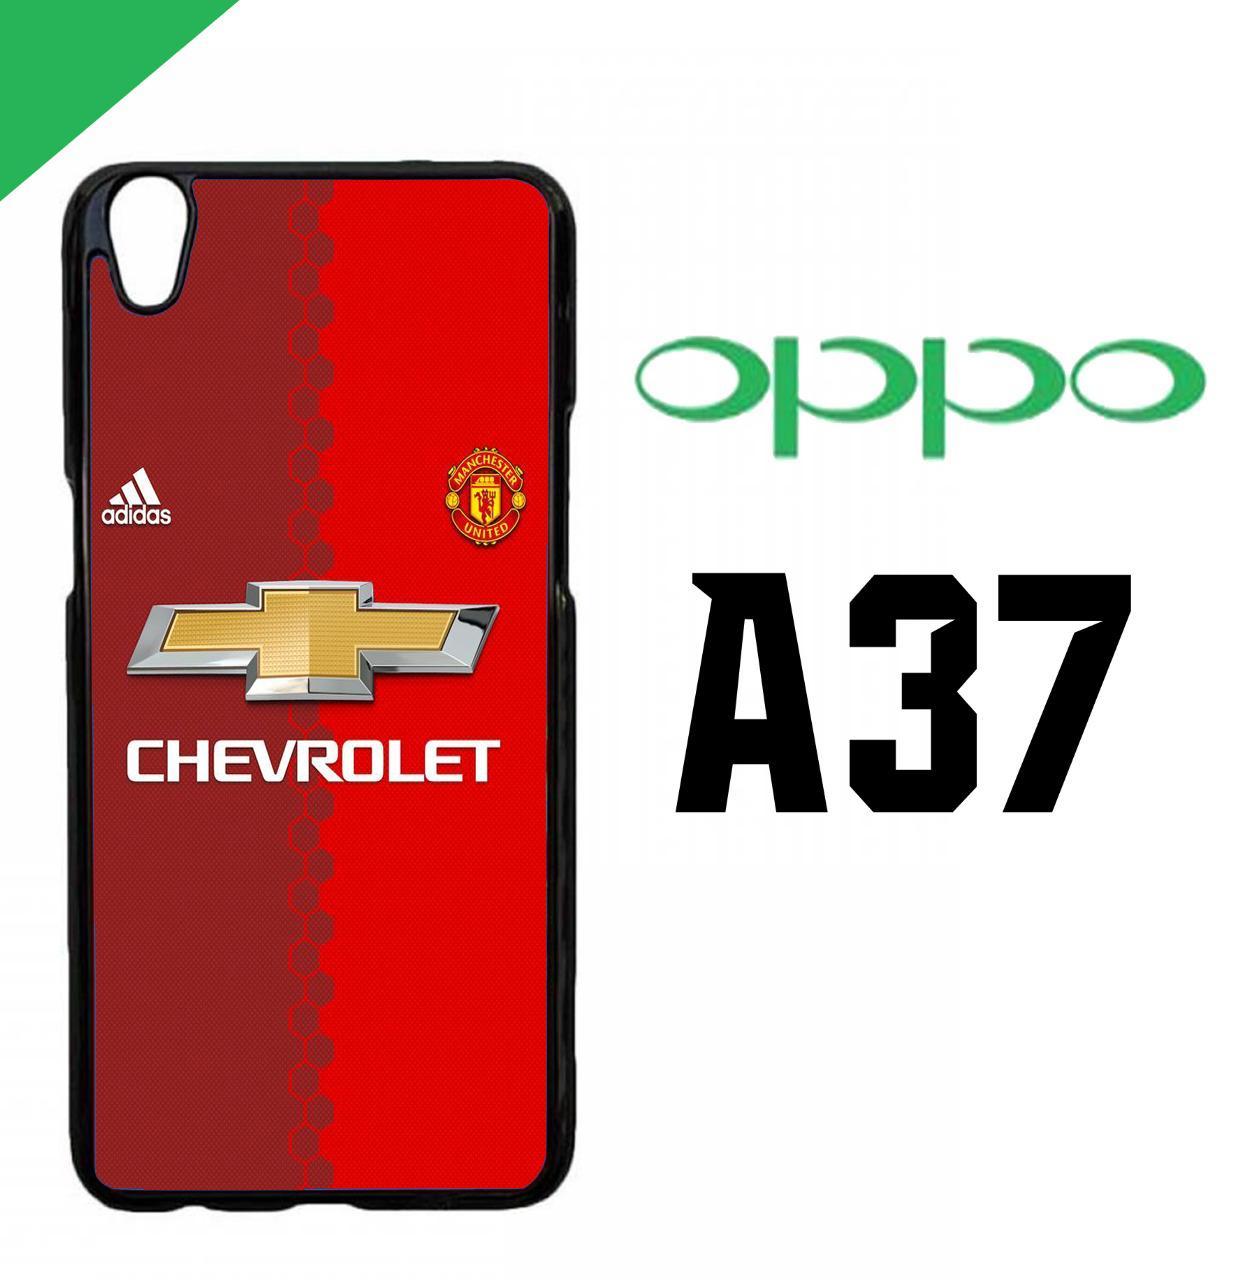 Oppo A37 Jayamurah Fashion Case Brand E-Sport 2-06